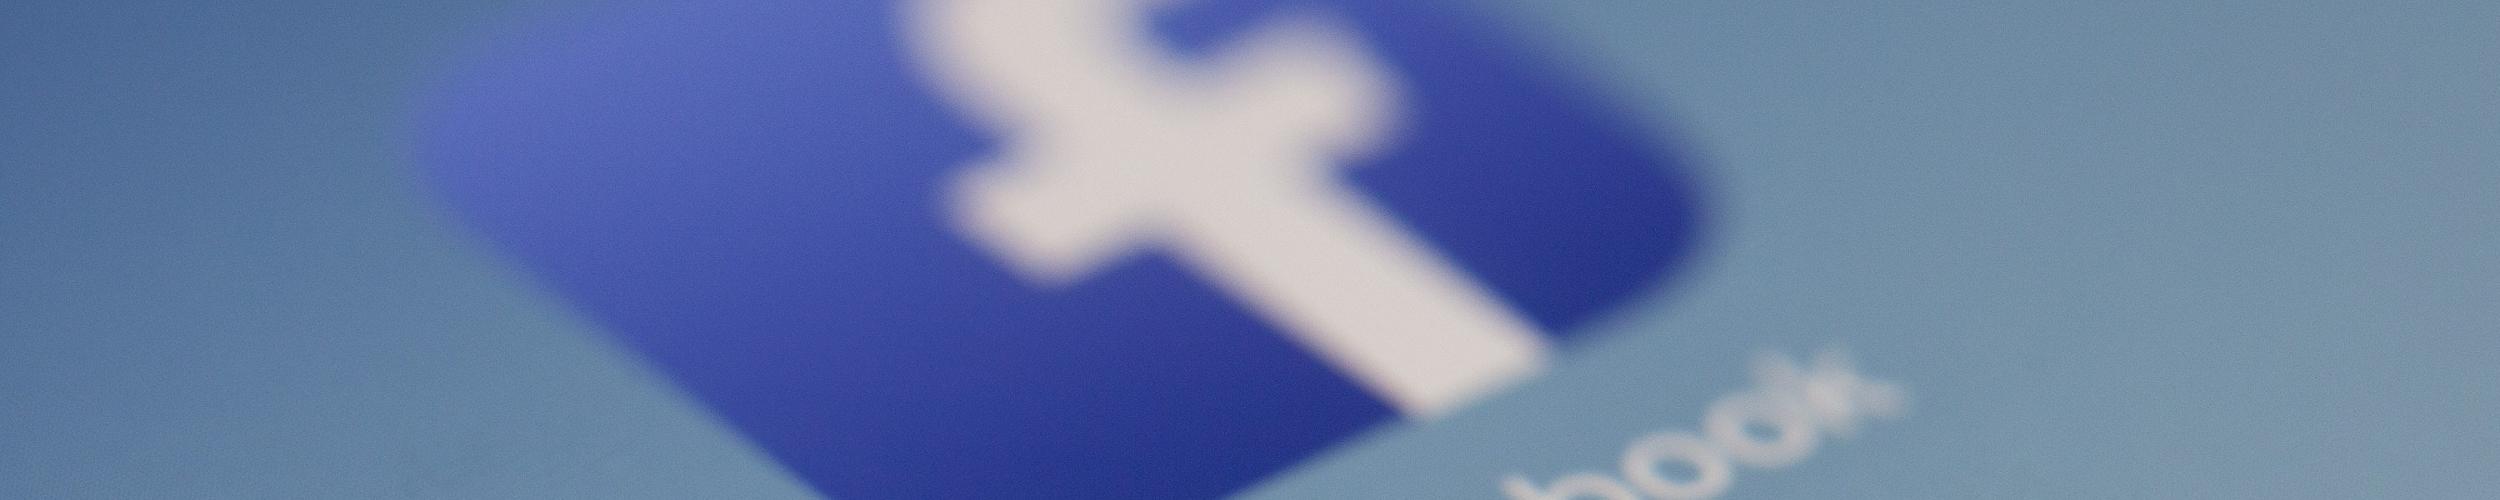 Bedrijfspagina op Facebook